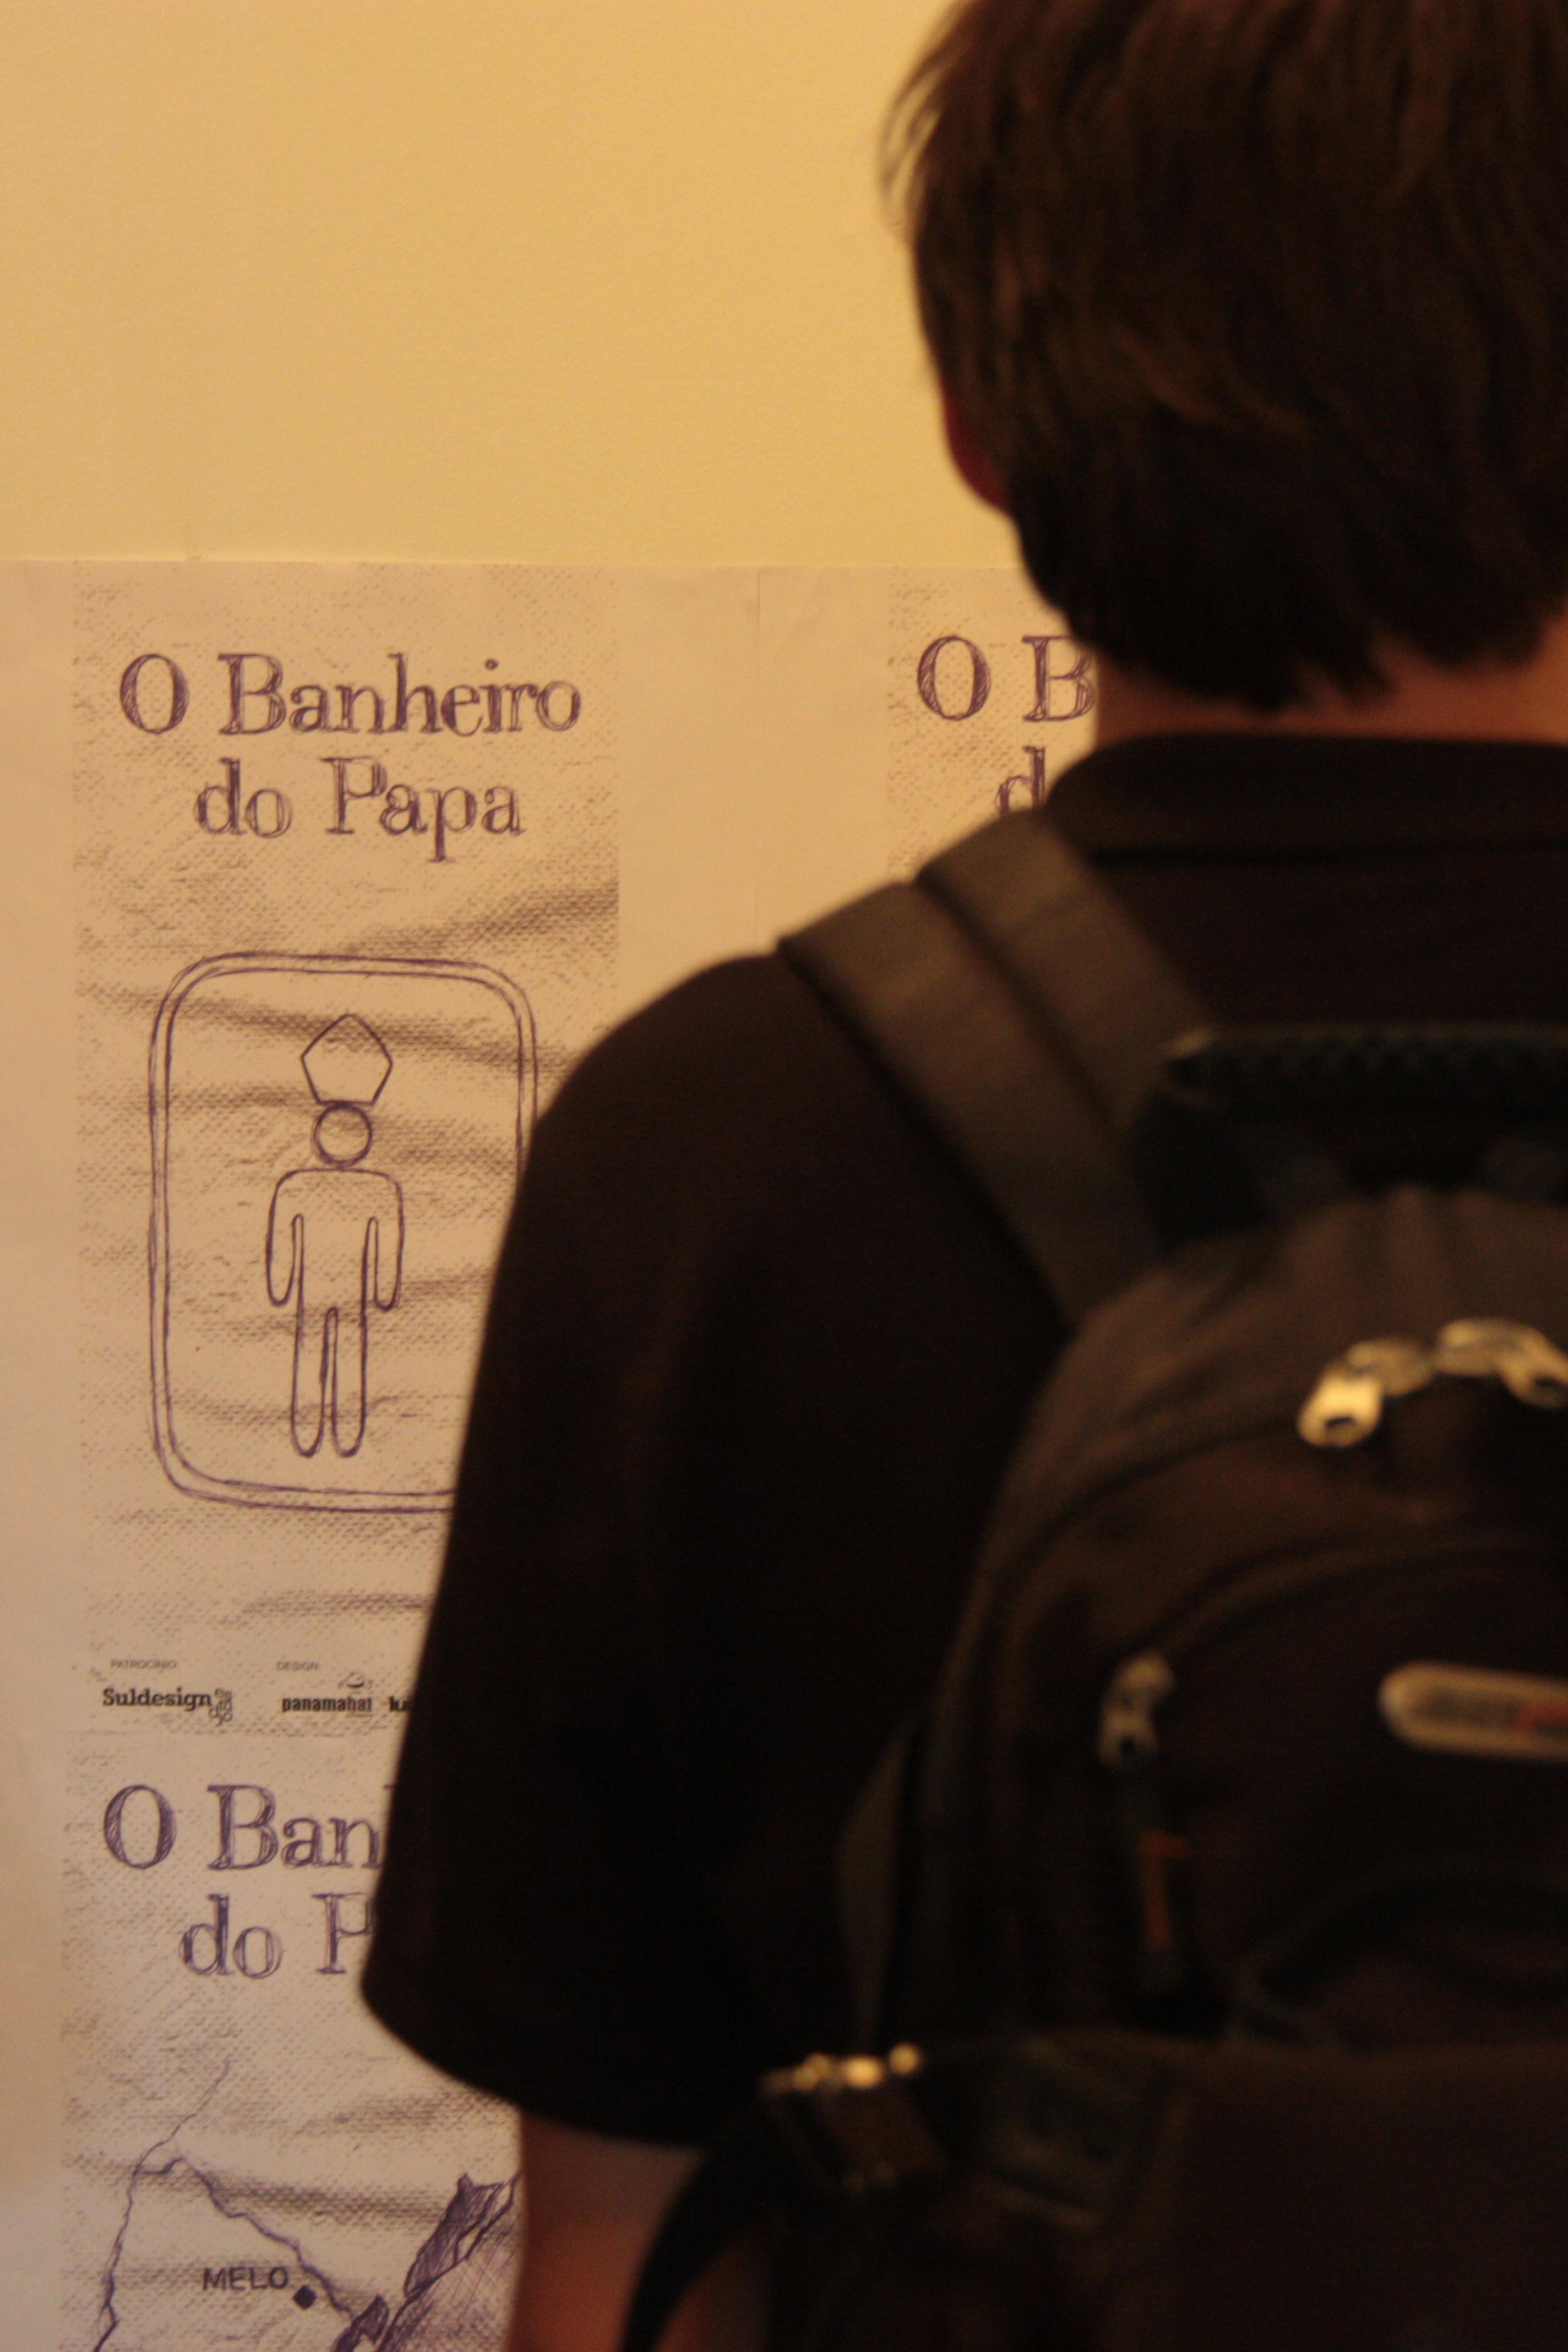 Banheiro do Papa Flickr Photo Sharing! #A87223 2848 4272